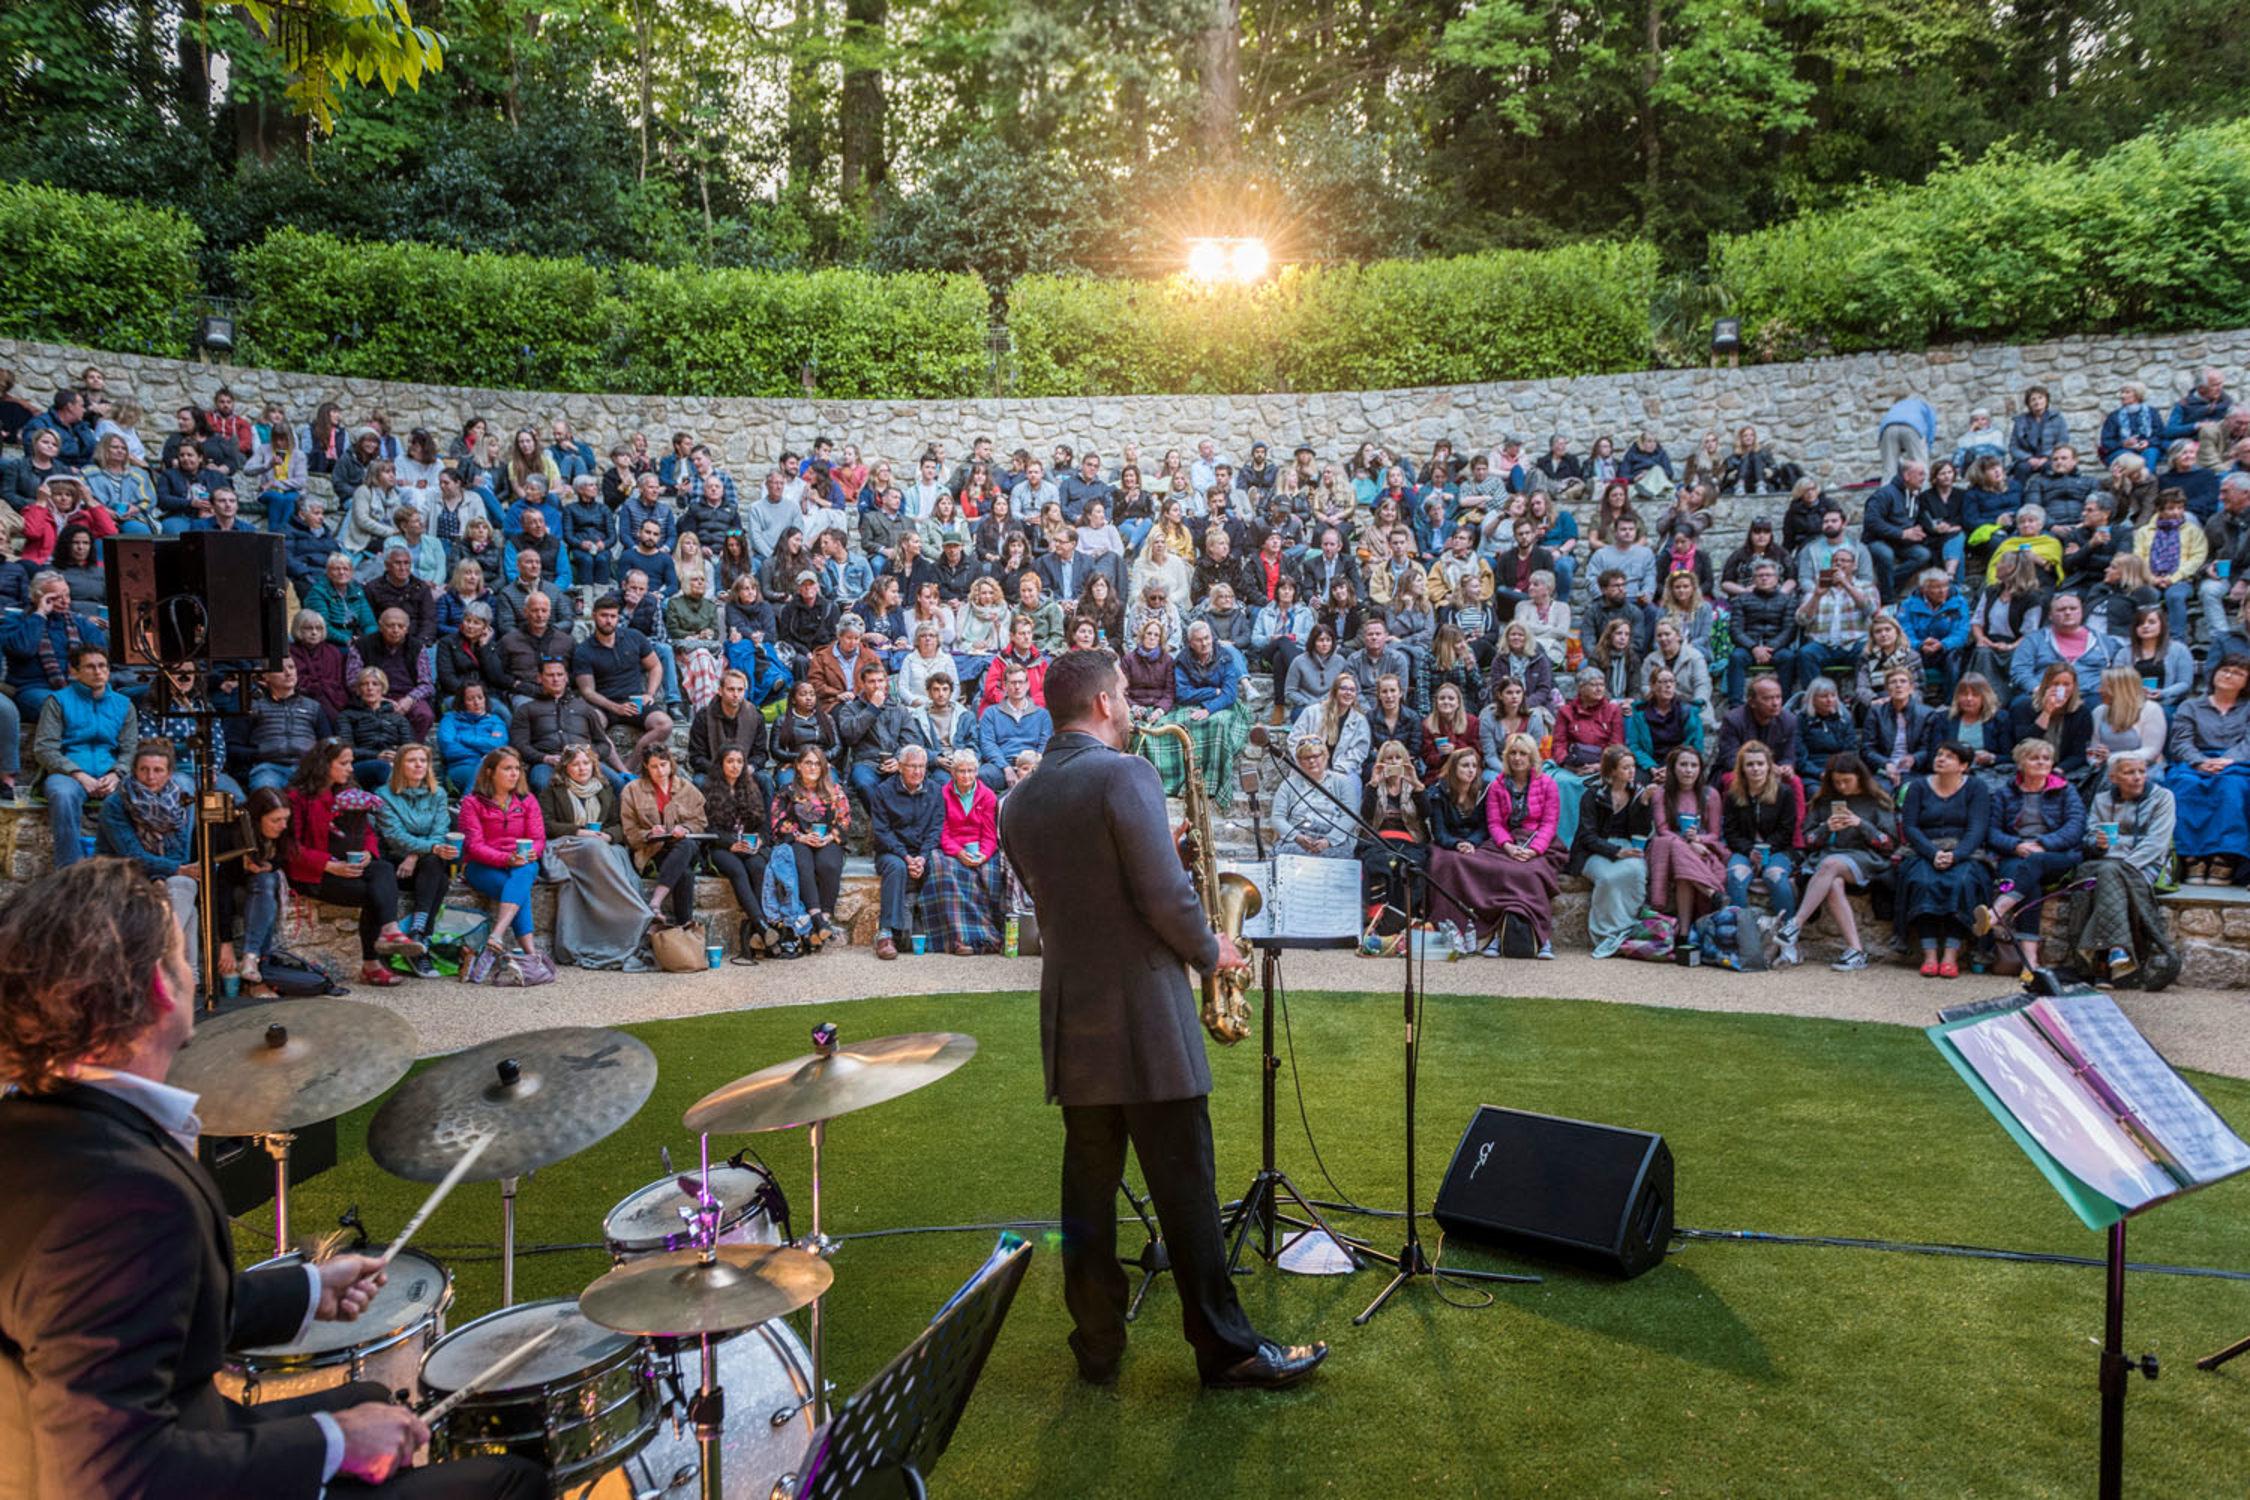 2019 Amphitheatre Season Launch